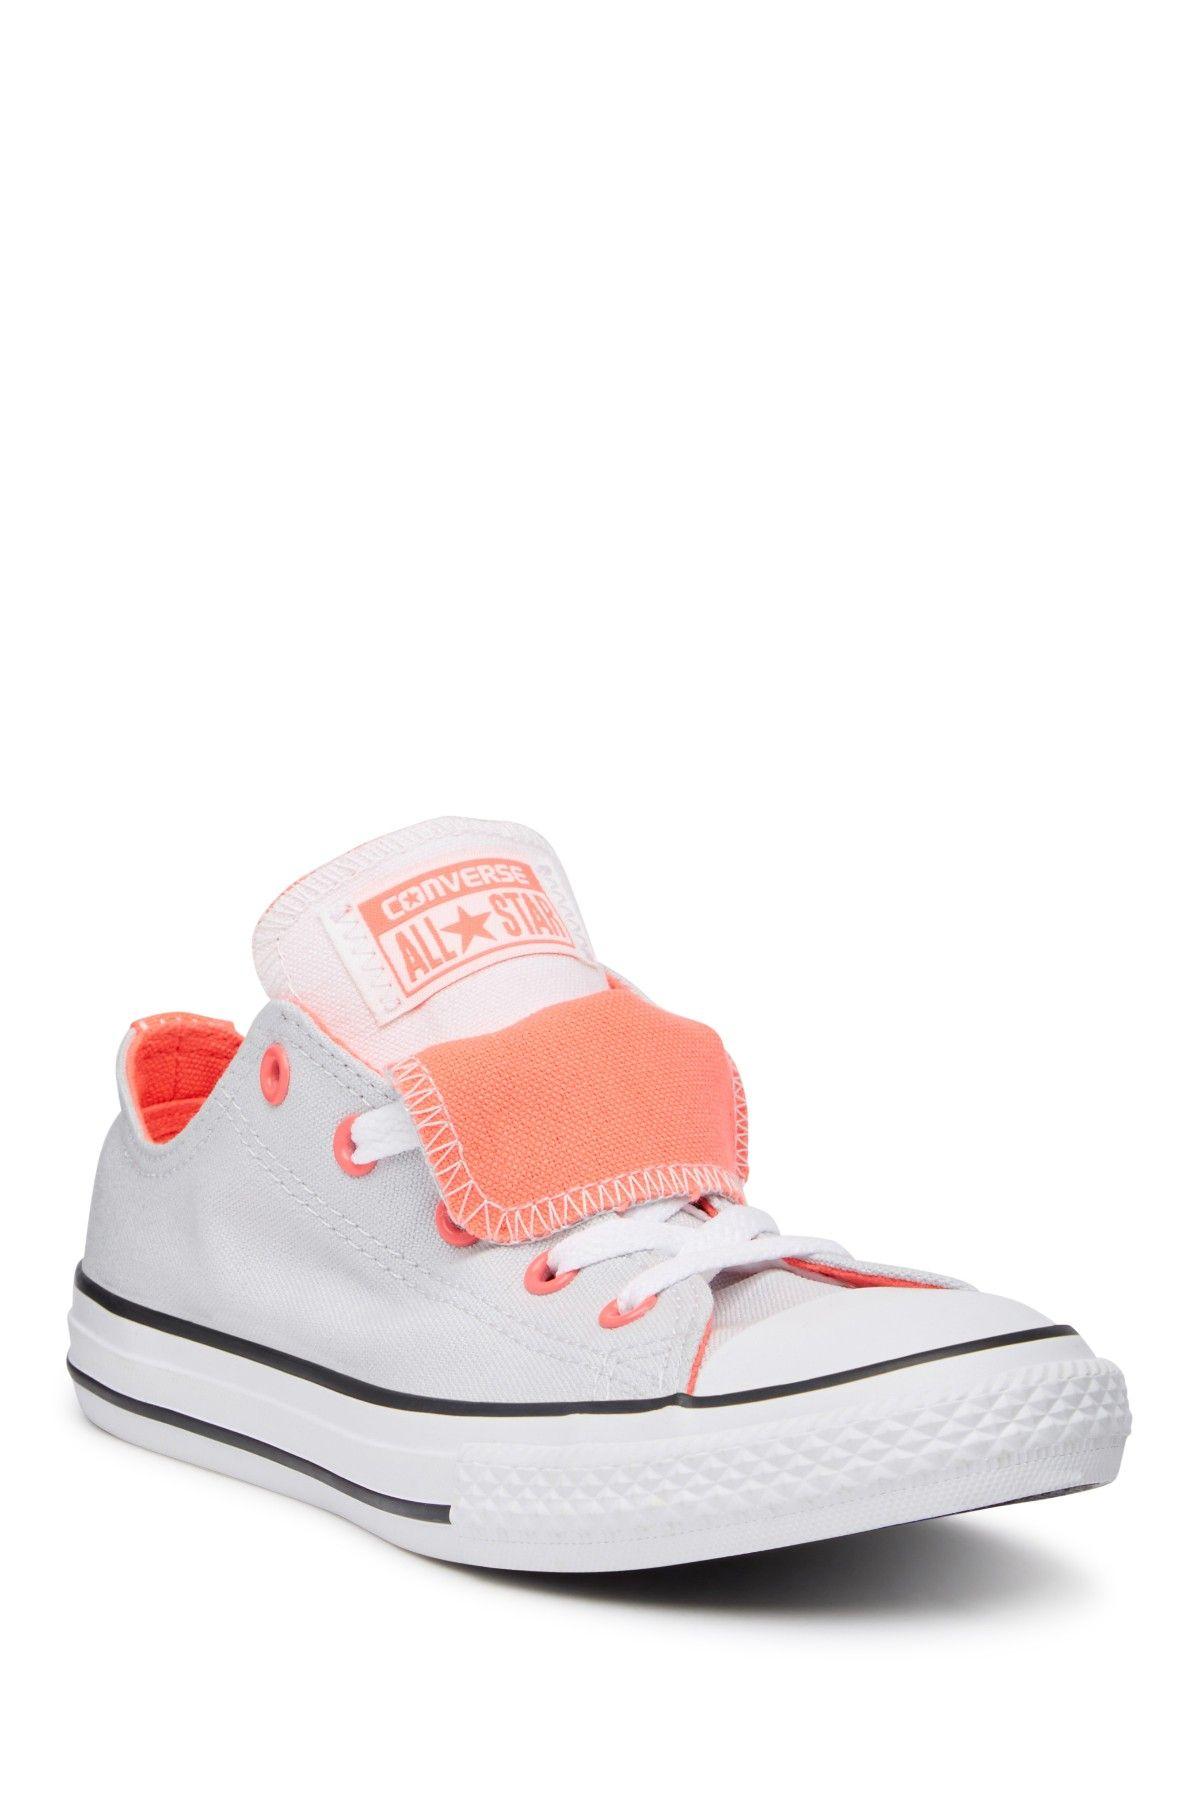 ba1e780846c9 Chuck Taylor All Star Double Tongue Oxford Sneaker (Little Kid   Big Kid)